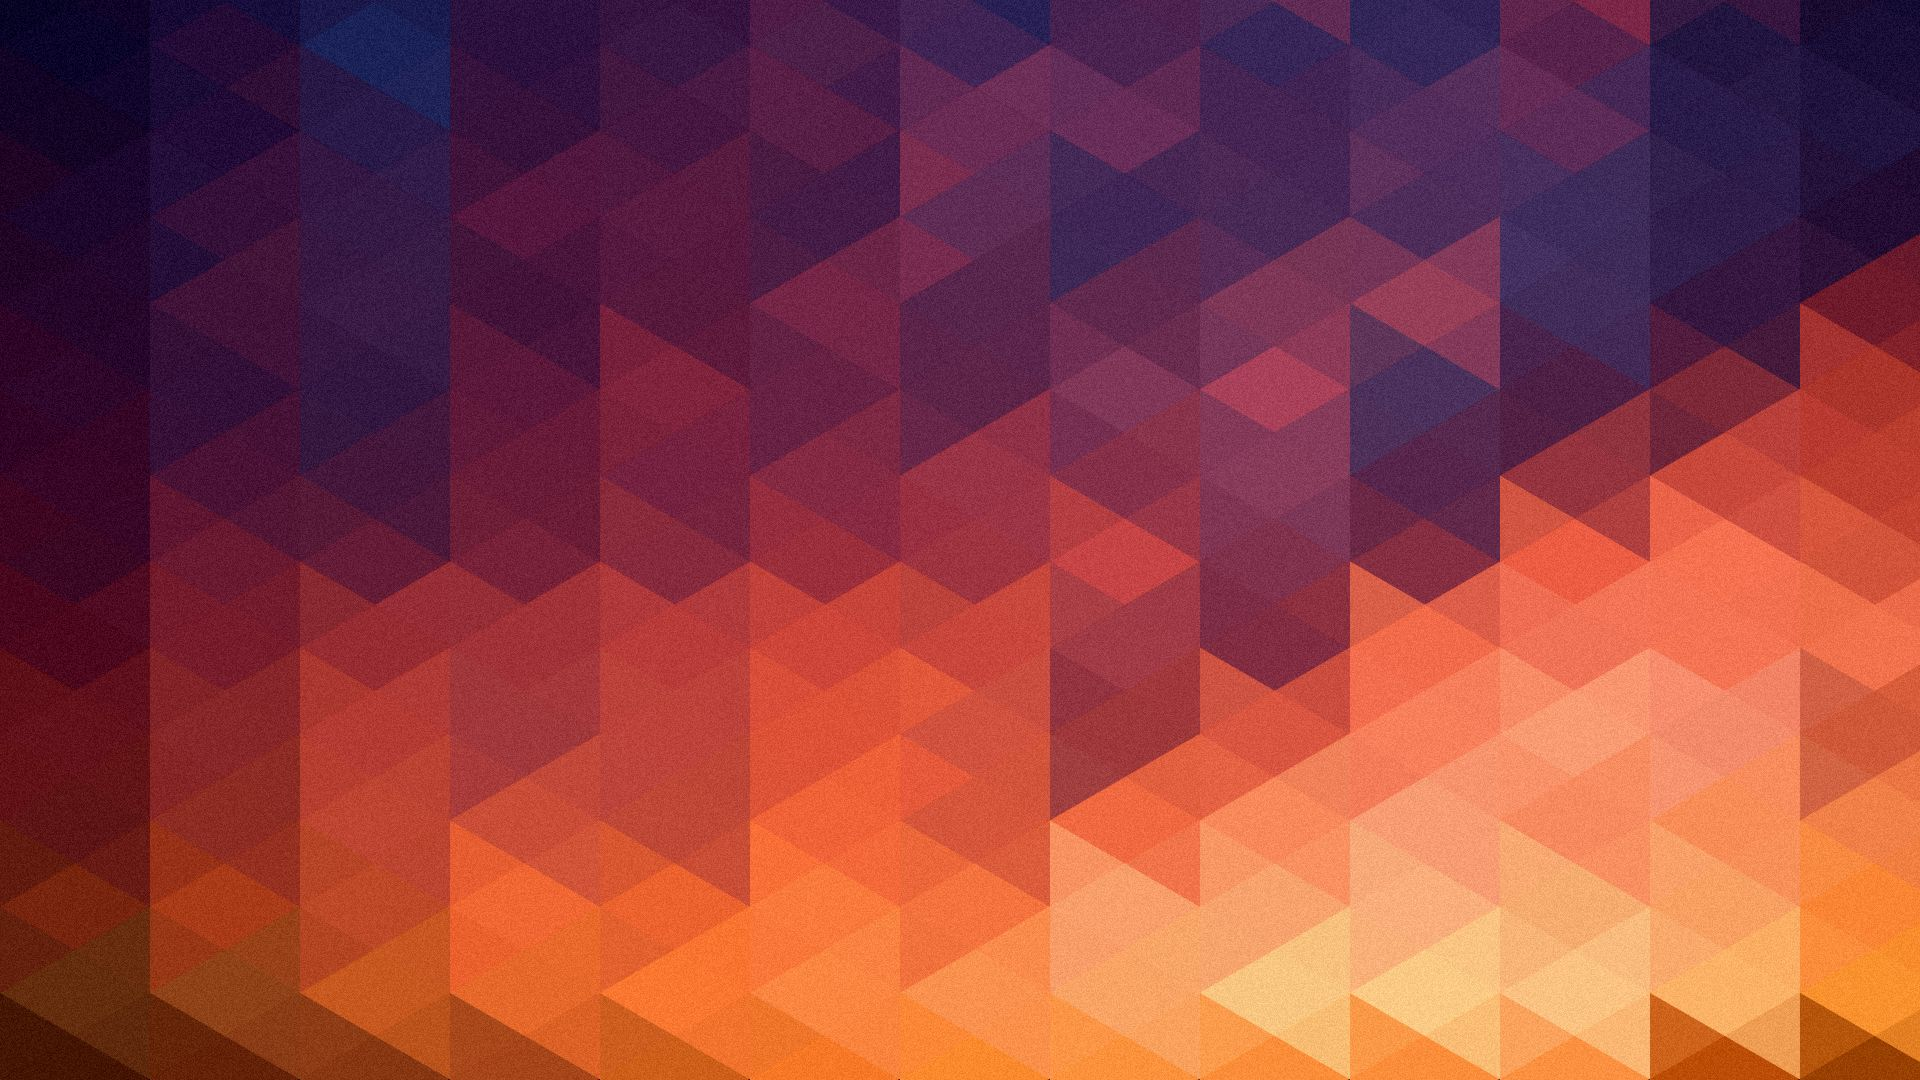 Best 52 Geometrical Wallpaper on HipWallpaper Geometrical 1920x1080